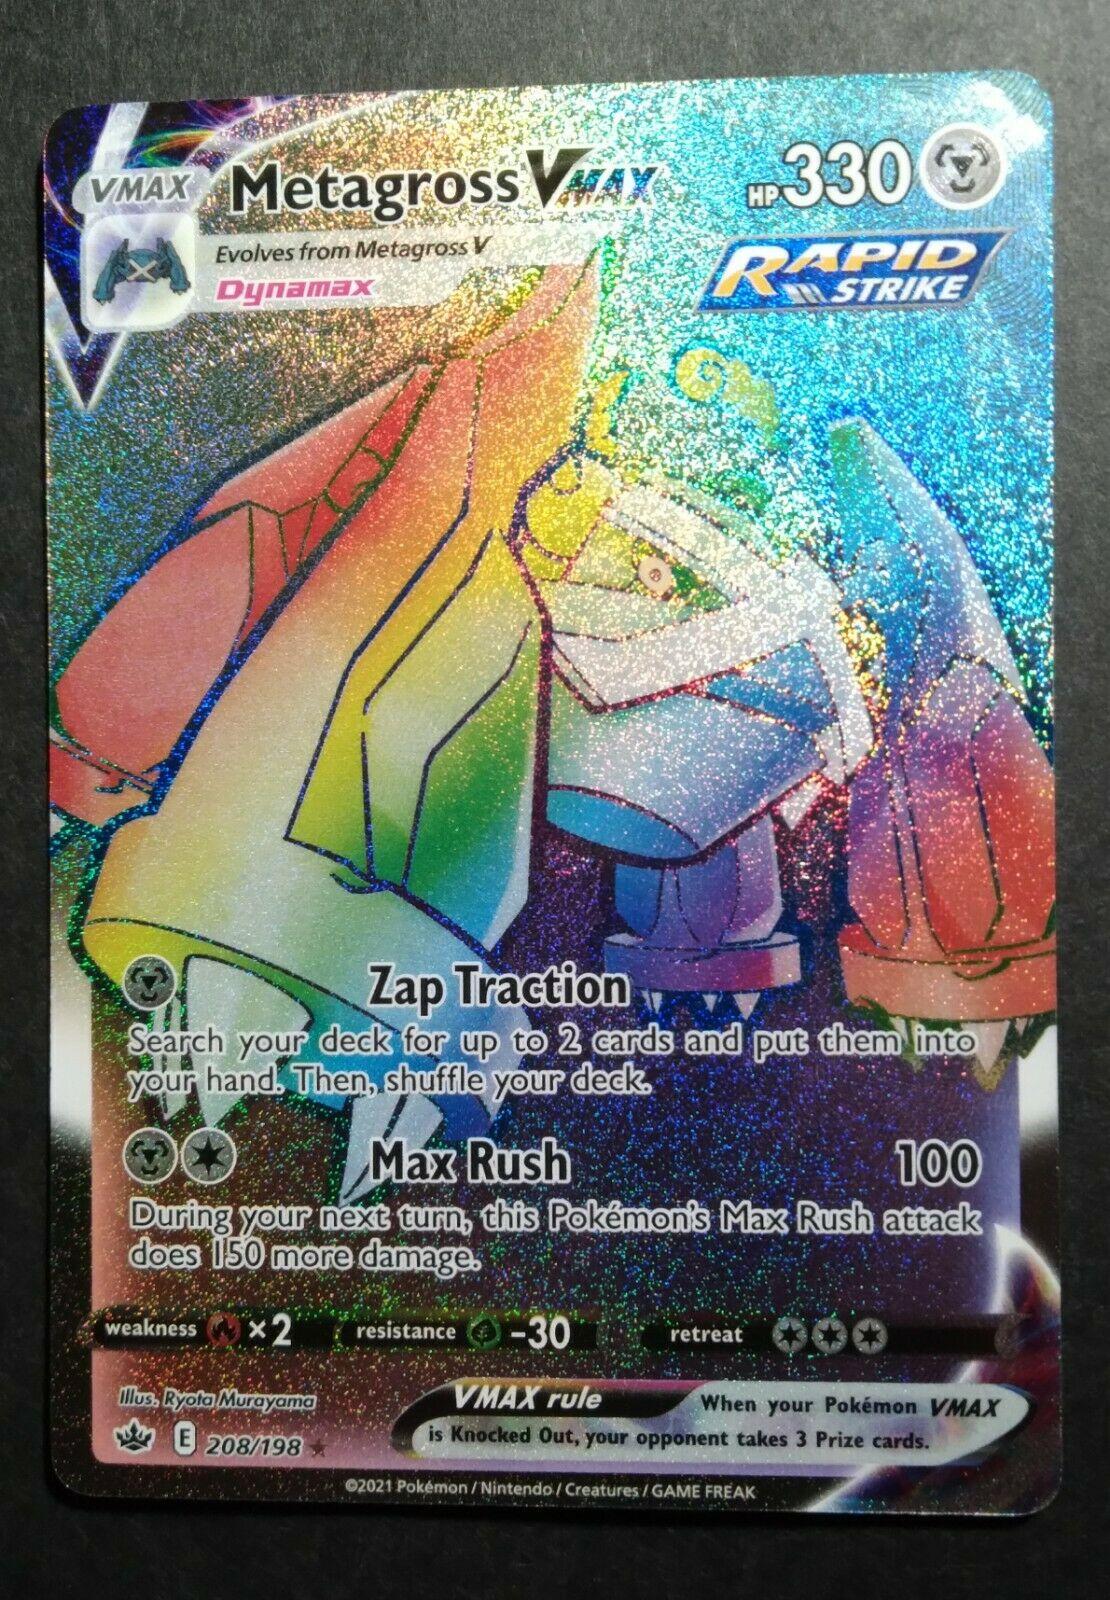 Pokemon TCG: Chilling Reign- Metagross VMAX 208/198 *Rainbow Secret Rare* - Image 1